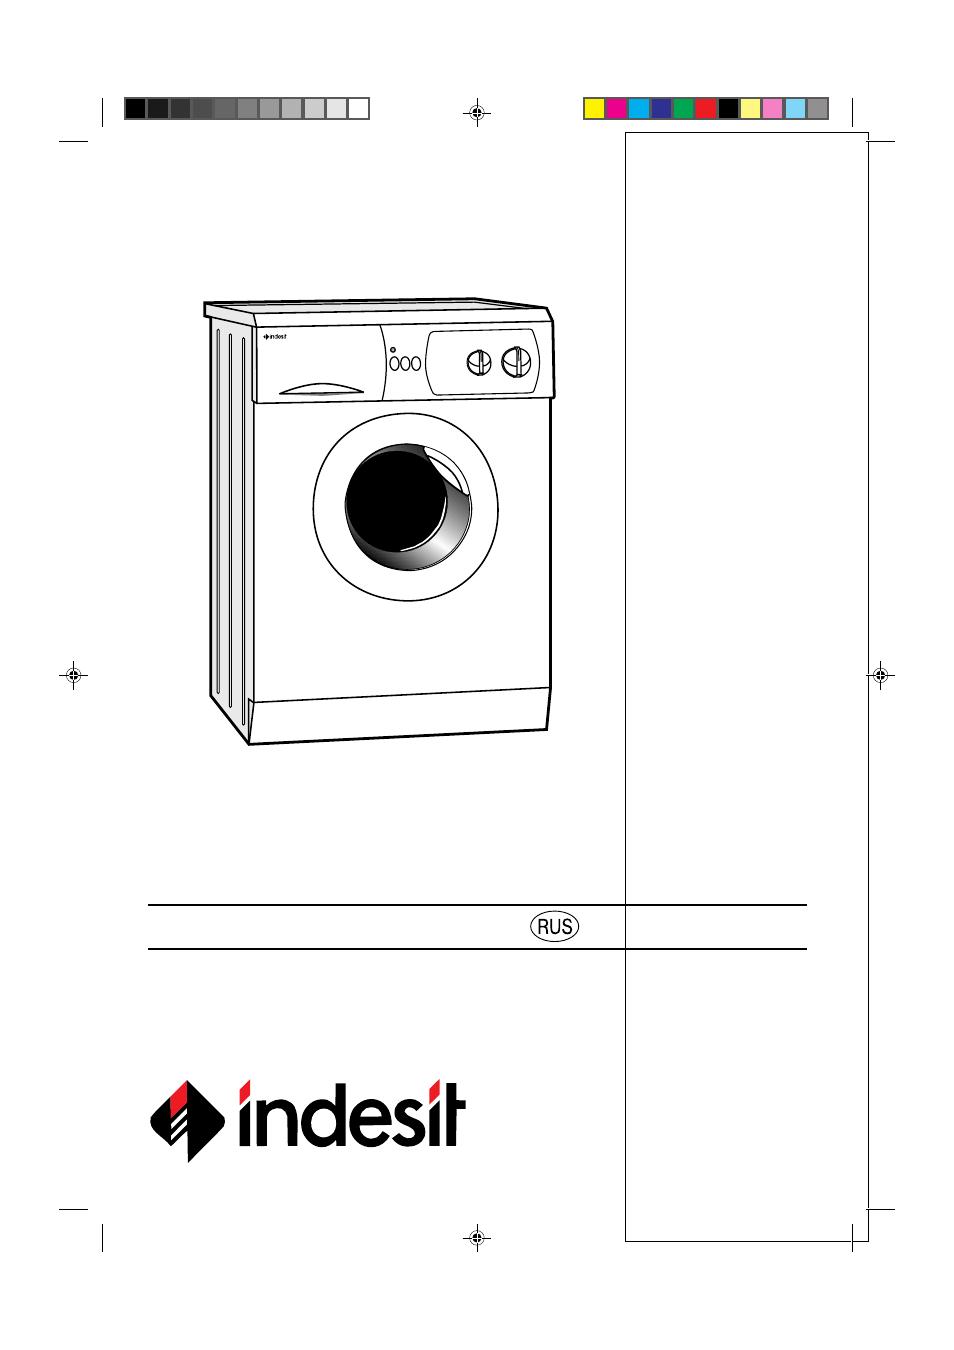 Indesit Wg 824 Инструкция